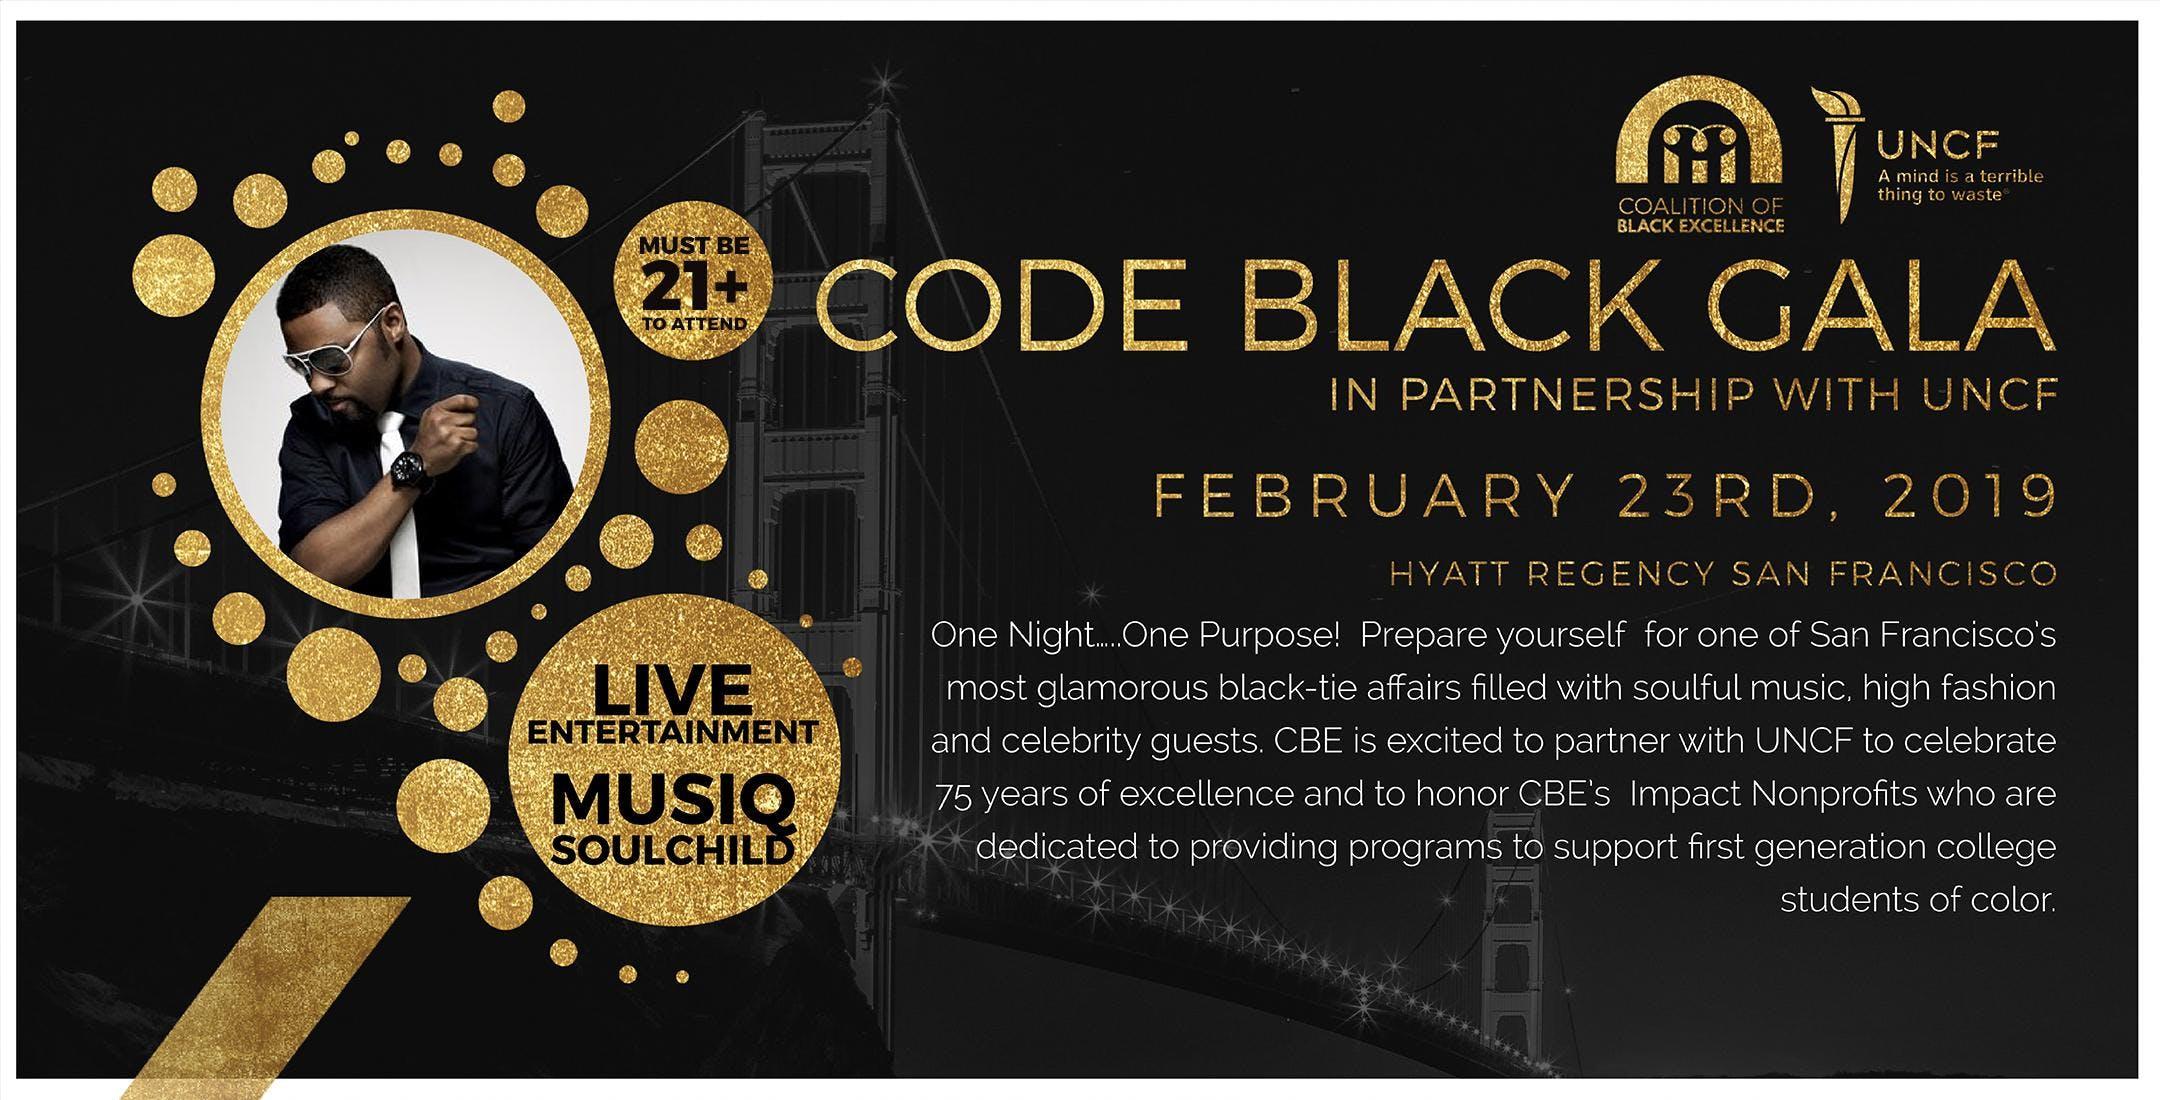 Code Black Gala 2019 at Hyatt Regency San Francisco in San Francisco